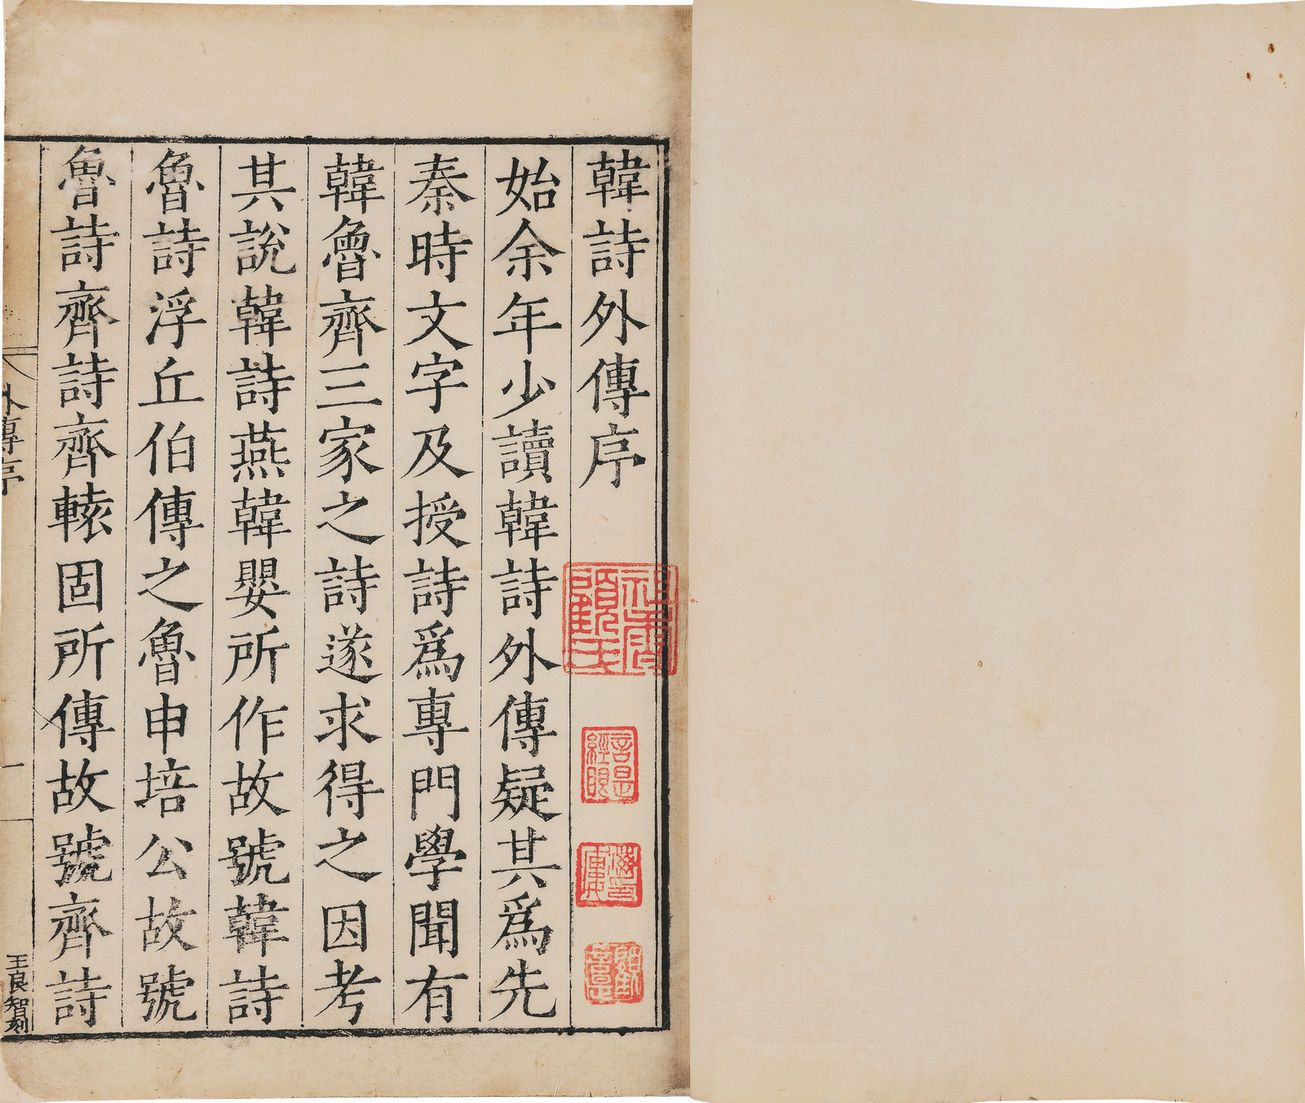 Chinese calligraphy - Rare Books/Rubbings/Manuscripts